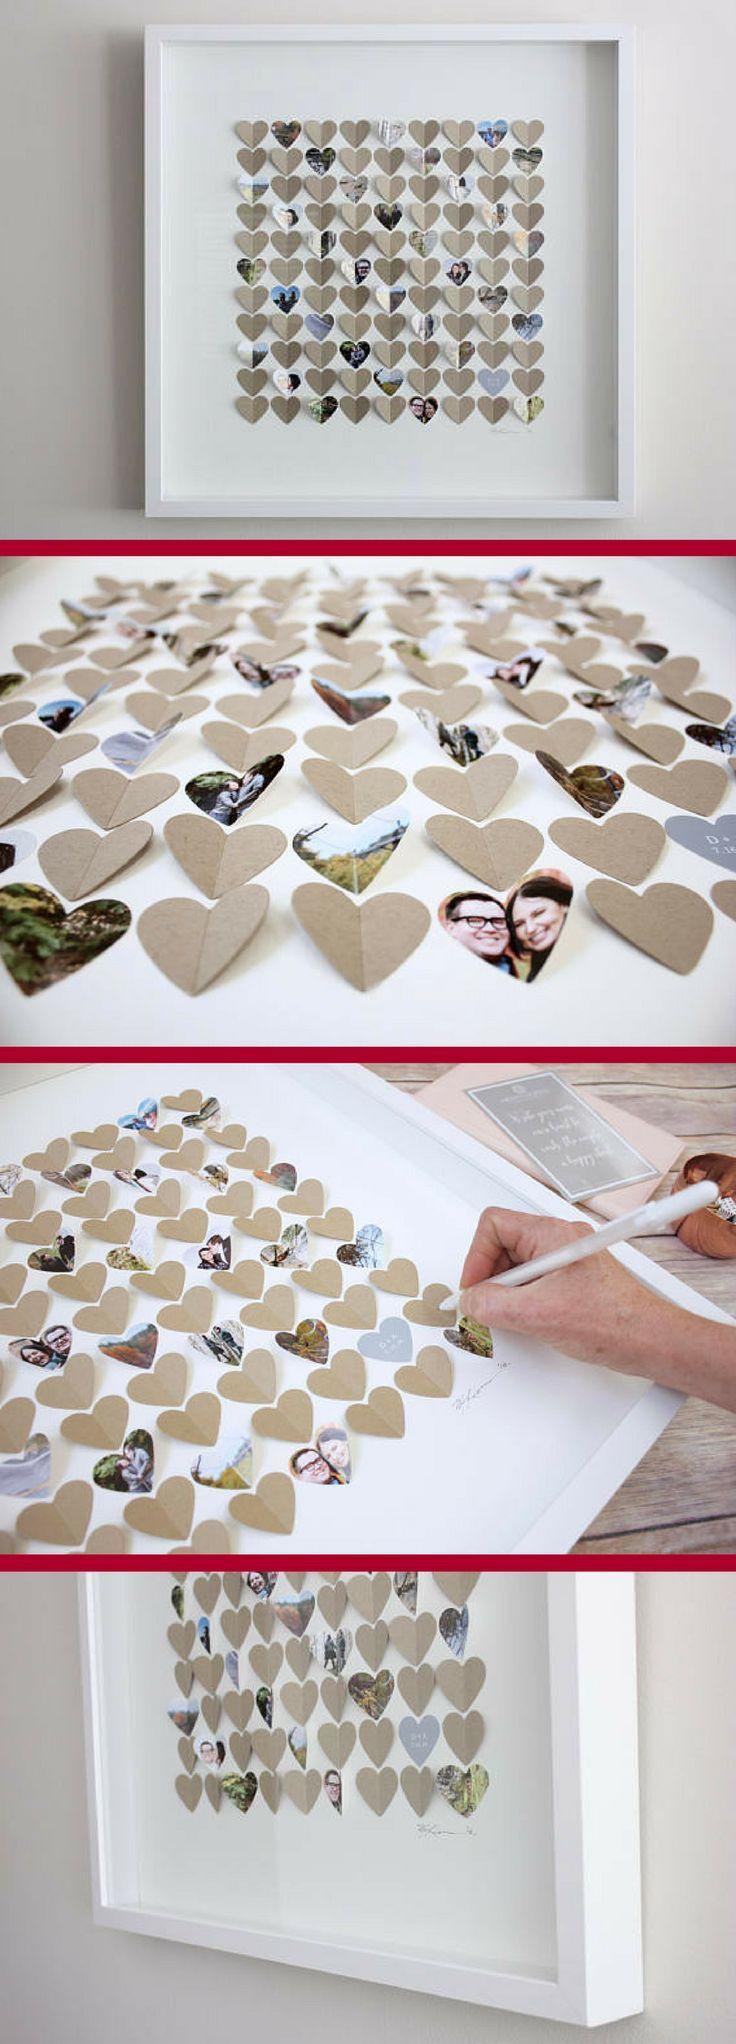 Super Cool 3D Wedding Guest Book Idea. #weddingideas #guestbook #wedding #bride #bridal #giftideas #ad